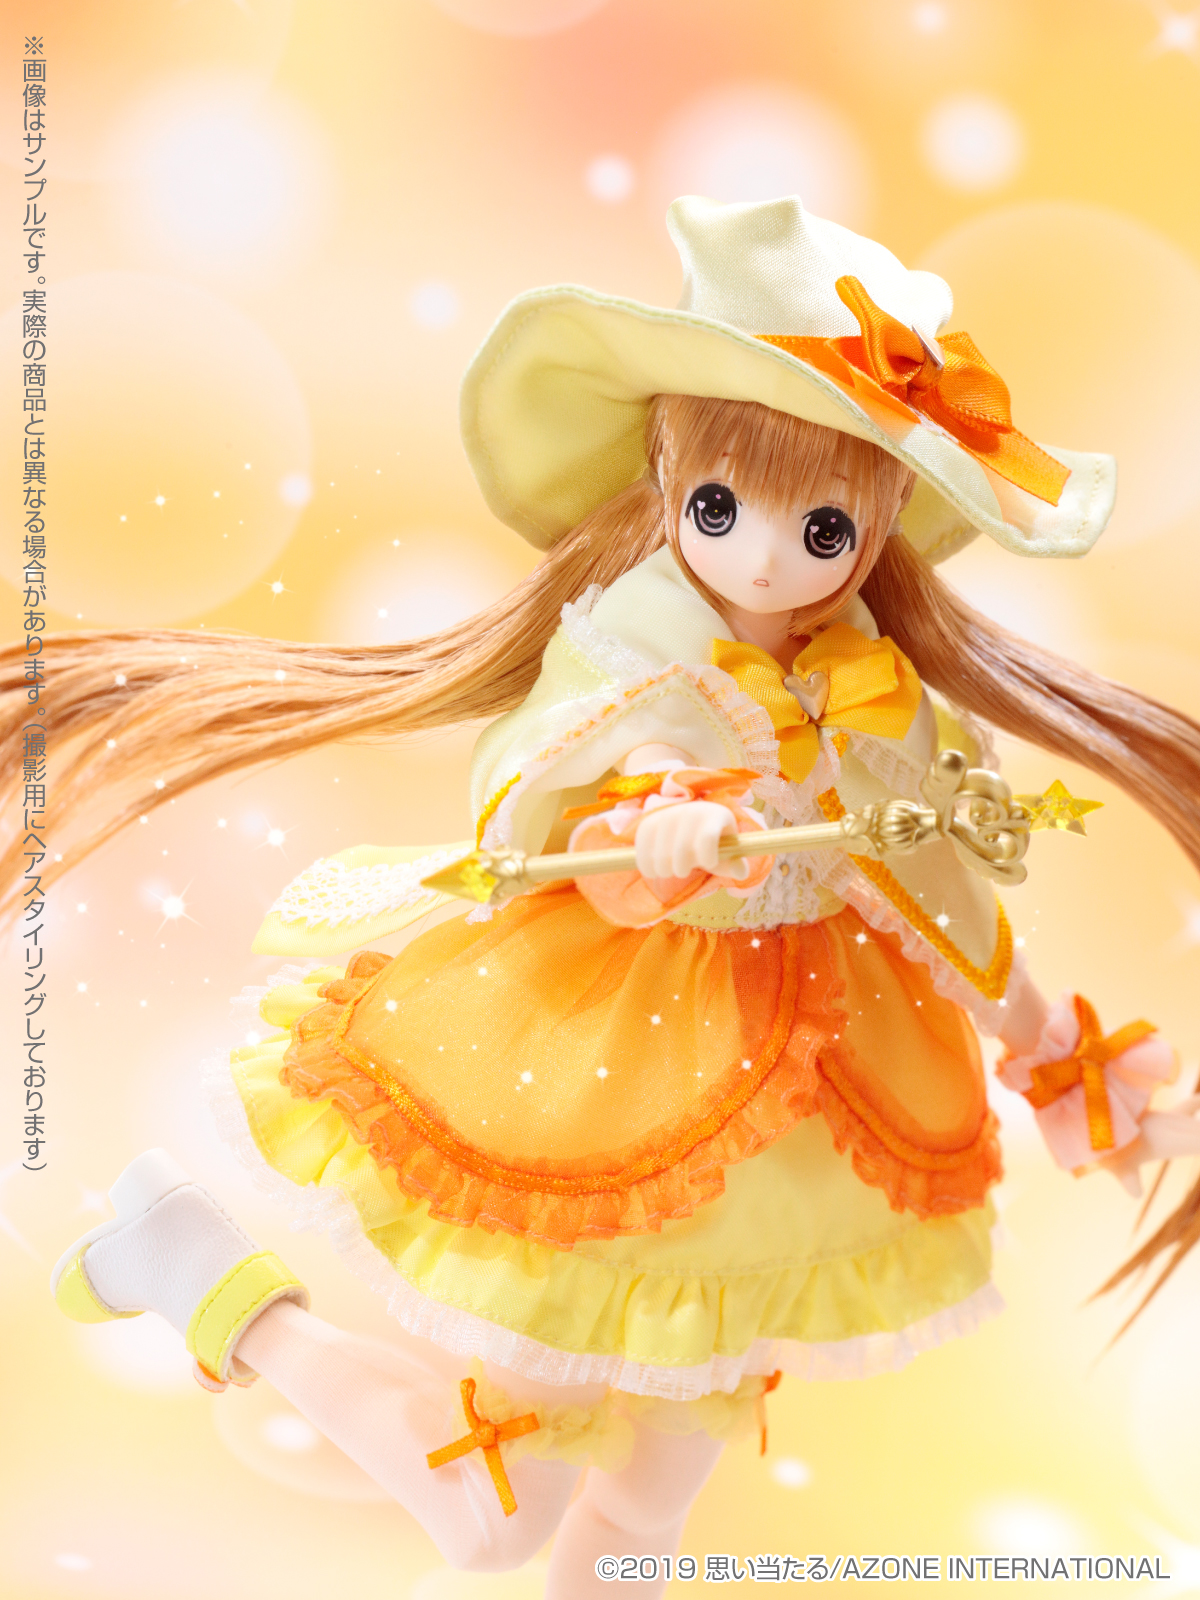 Magical☆CUTE『Pure Heart Chiika(ピュアハート ちいか)』えっくす☆きゅーと 1/6 完成品ドール-008